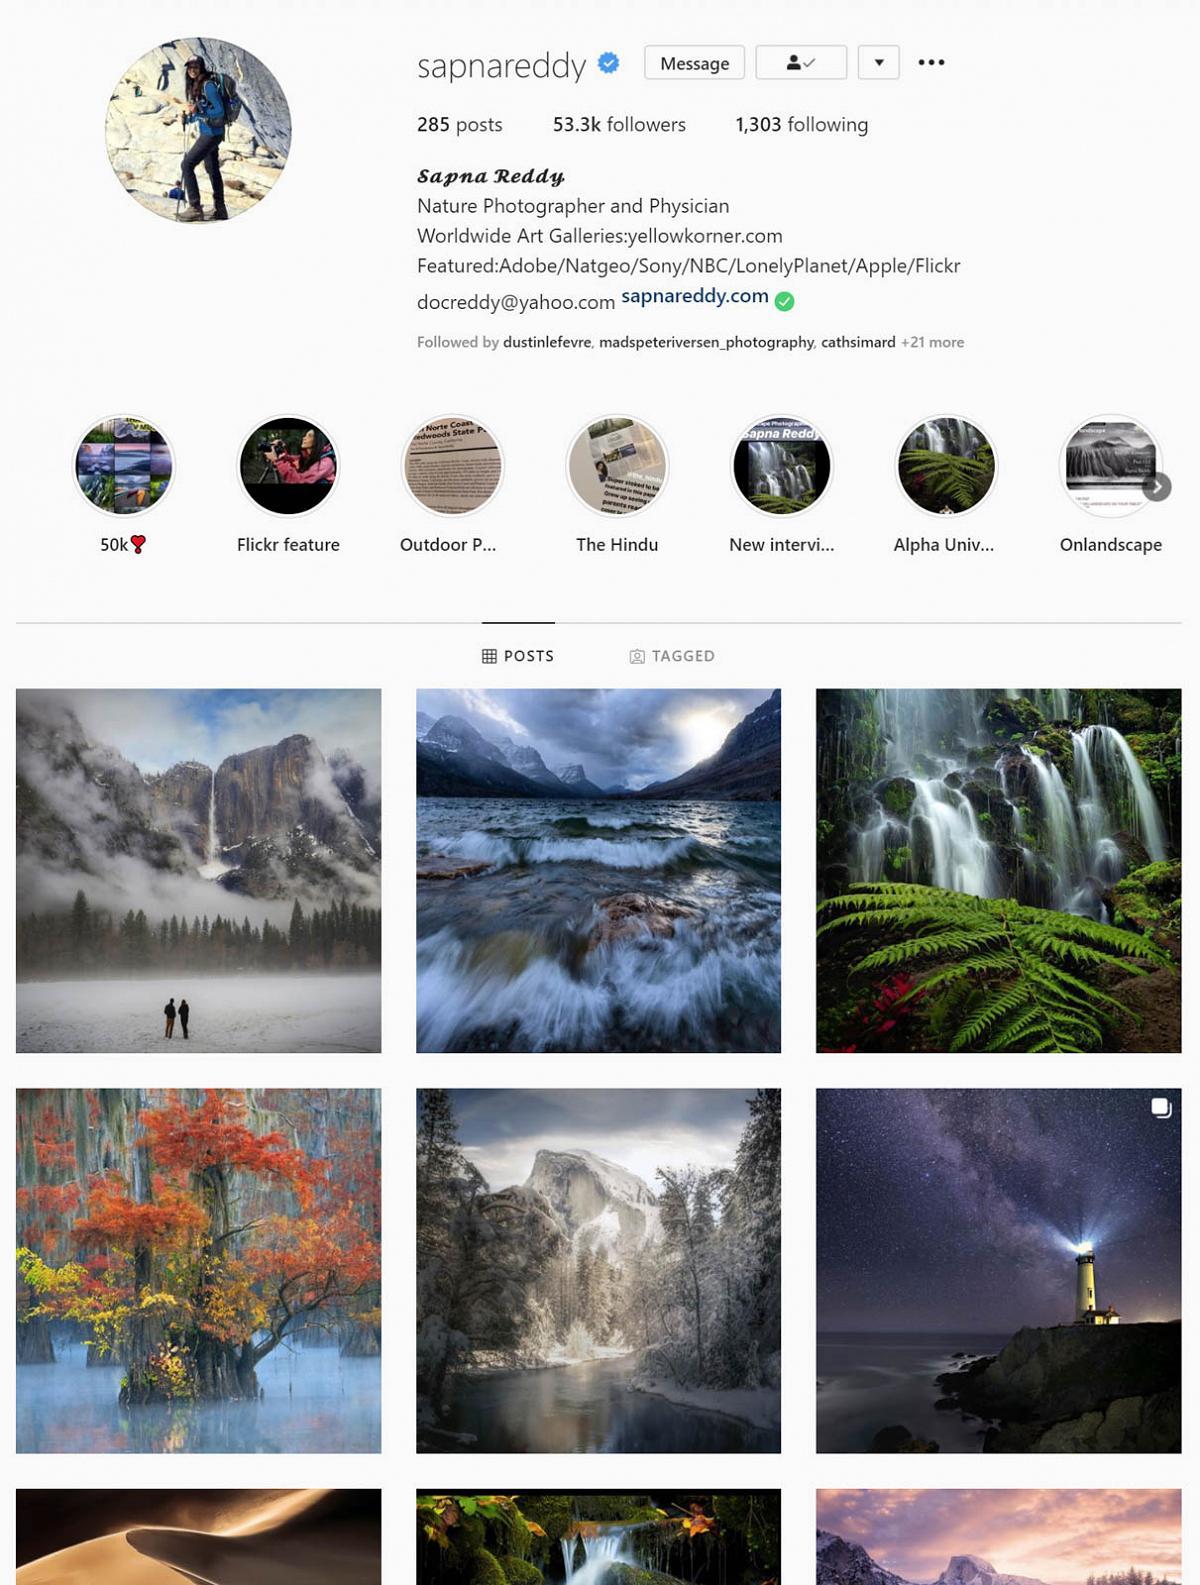 Sapna Reddy instagram gallery 1